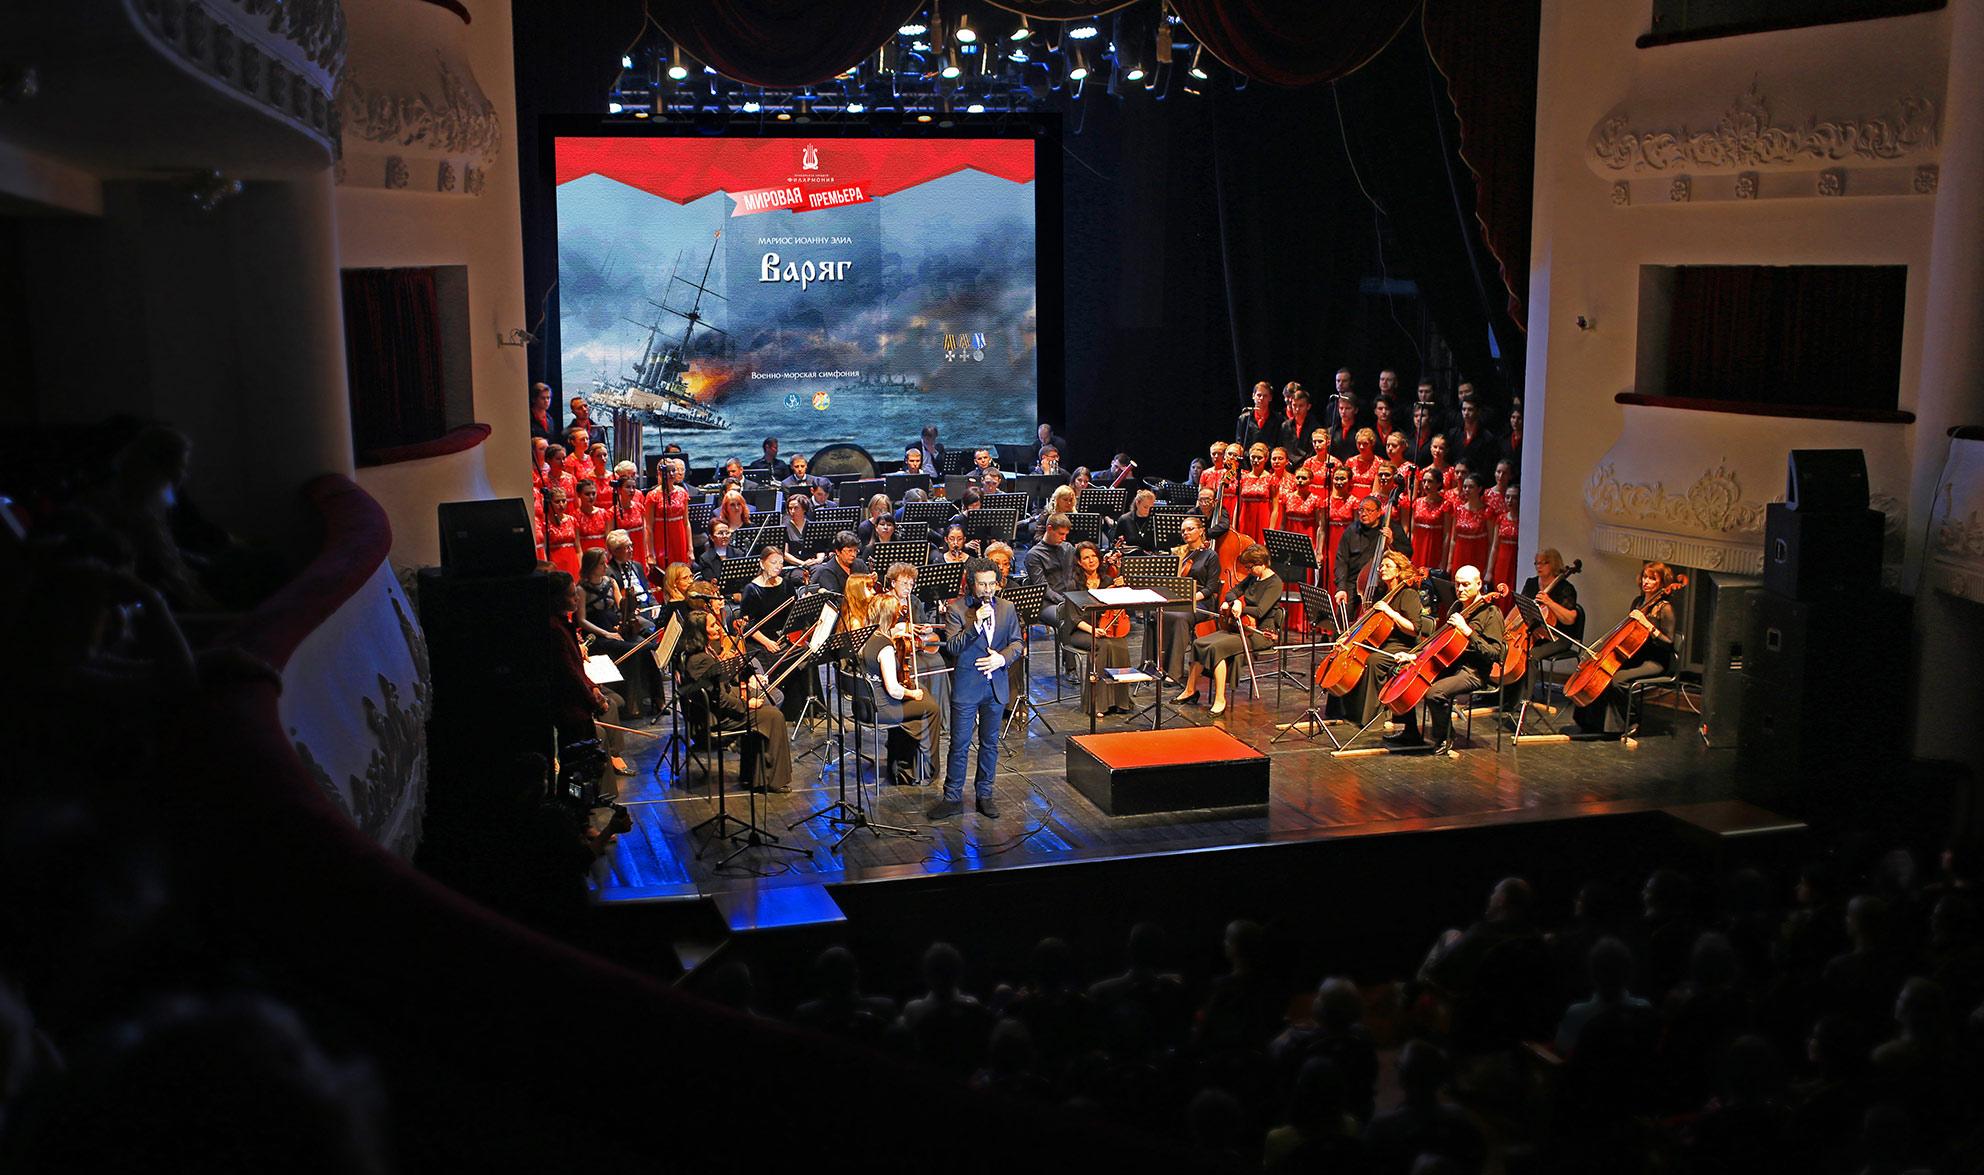 VARYAG by Marios Joannou Elia, Primorye Philharmonic, Mariinsky Theatre